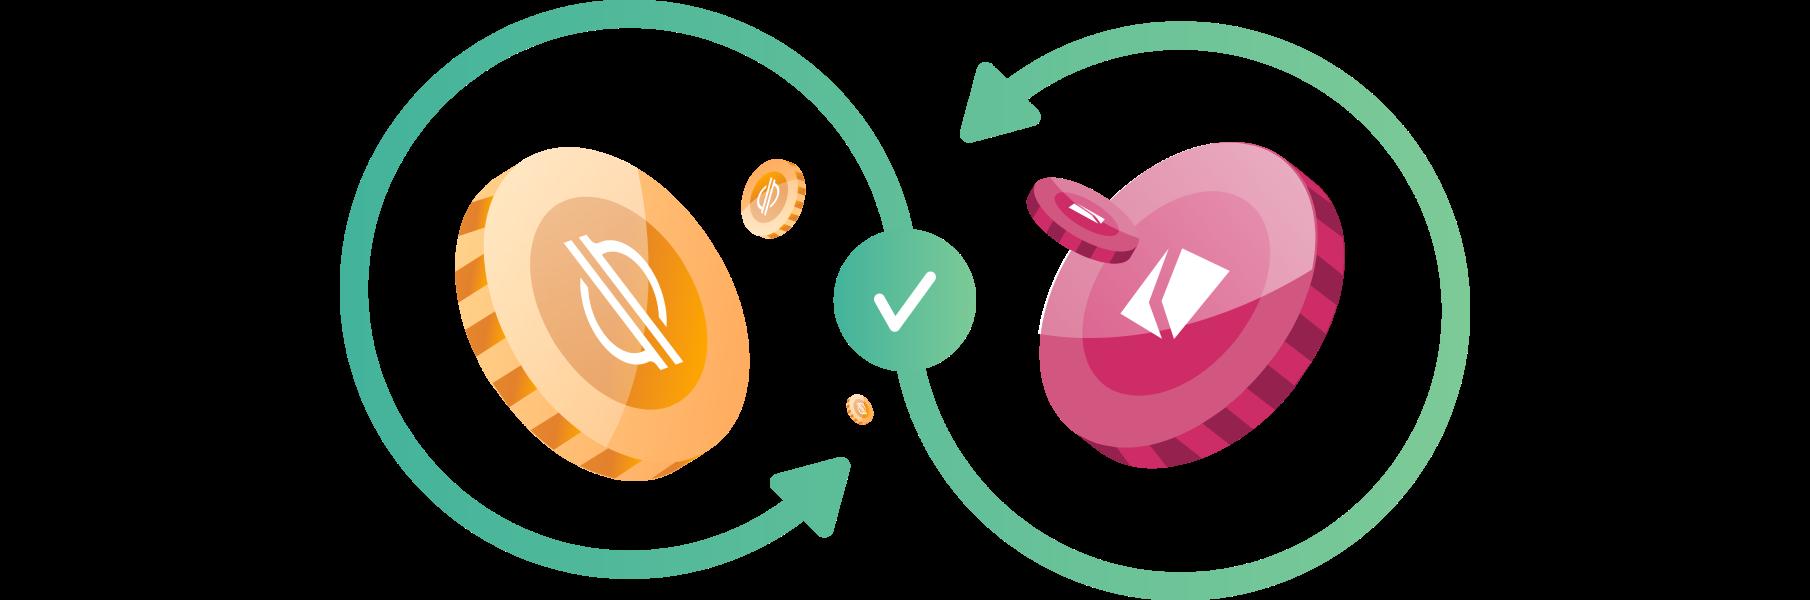 Swap Crypto